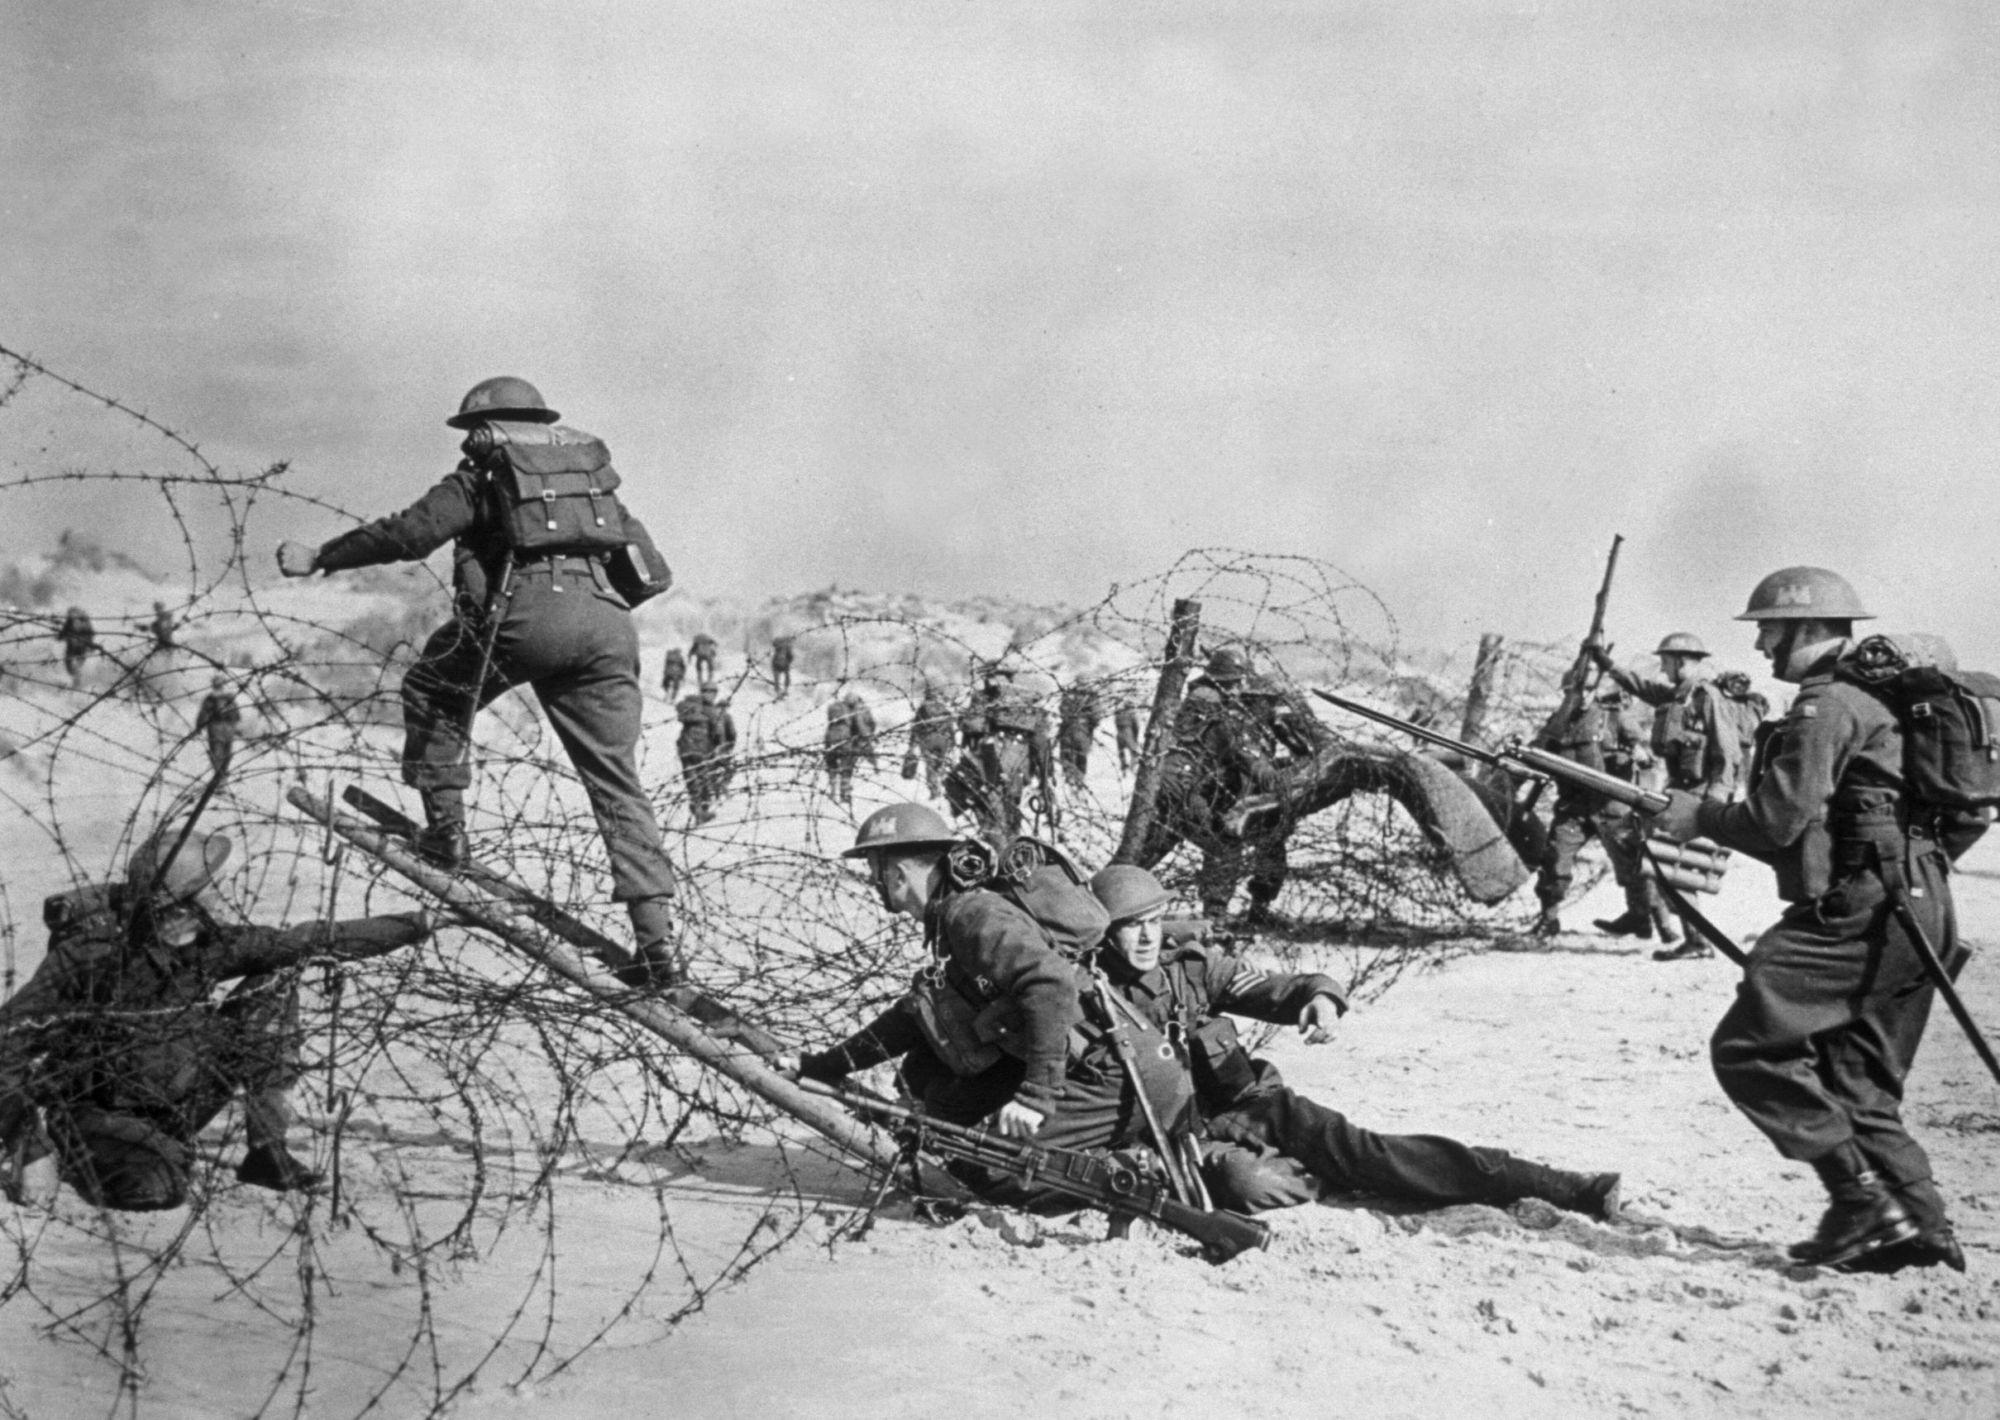 British troops come ashore